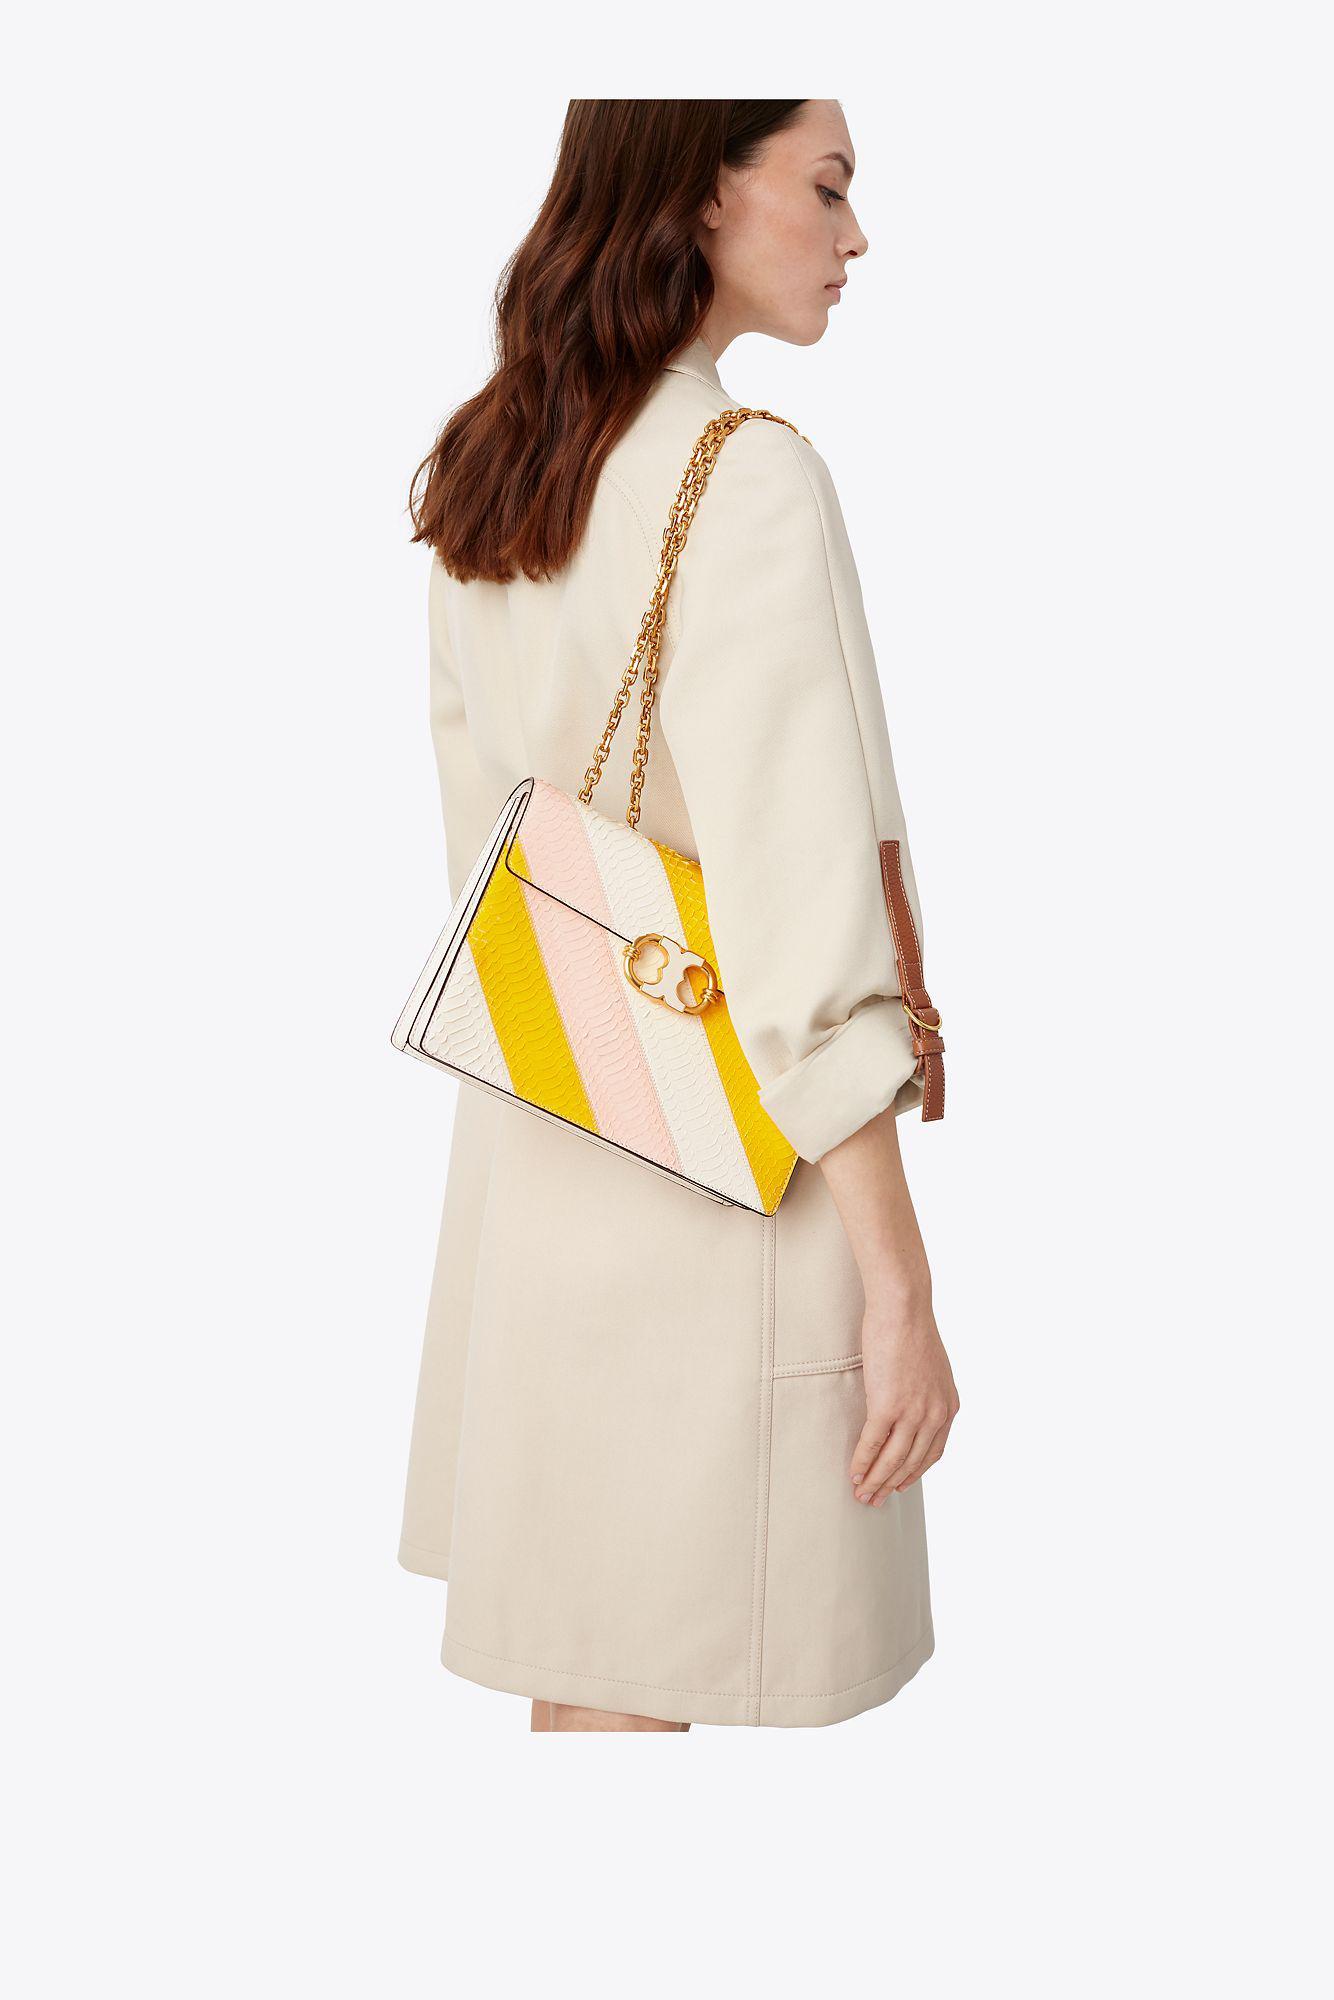 387d25ad6fa Lyst - Tory Burch Gemini Link Snake Medium Chain Shoulder Bag in Pink